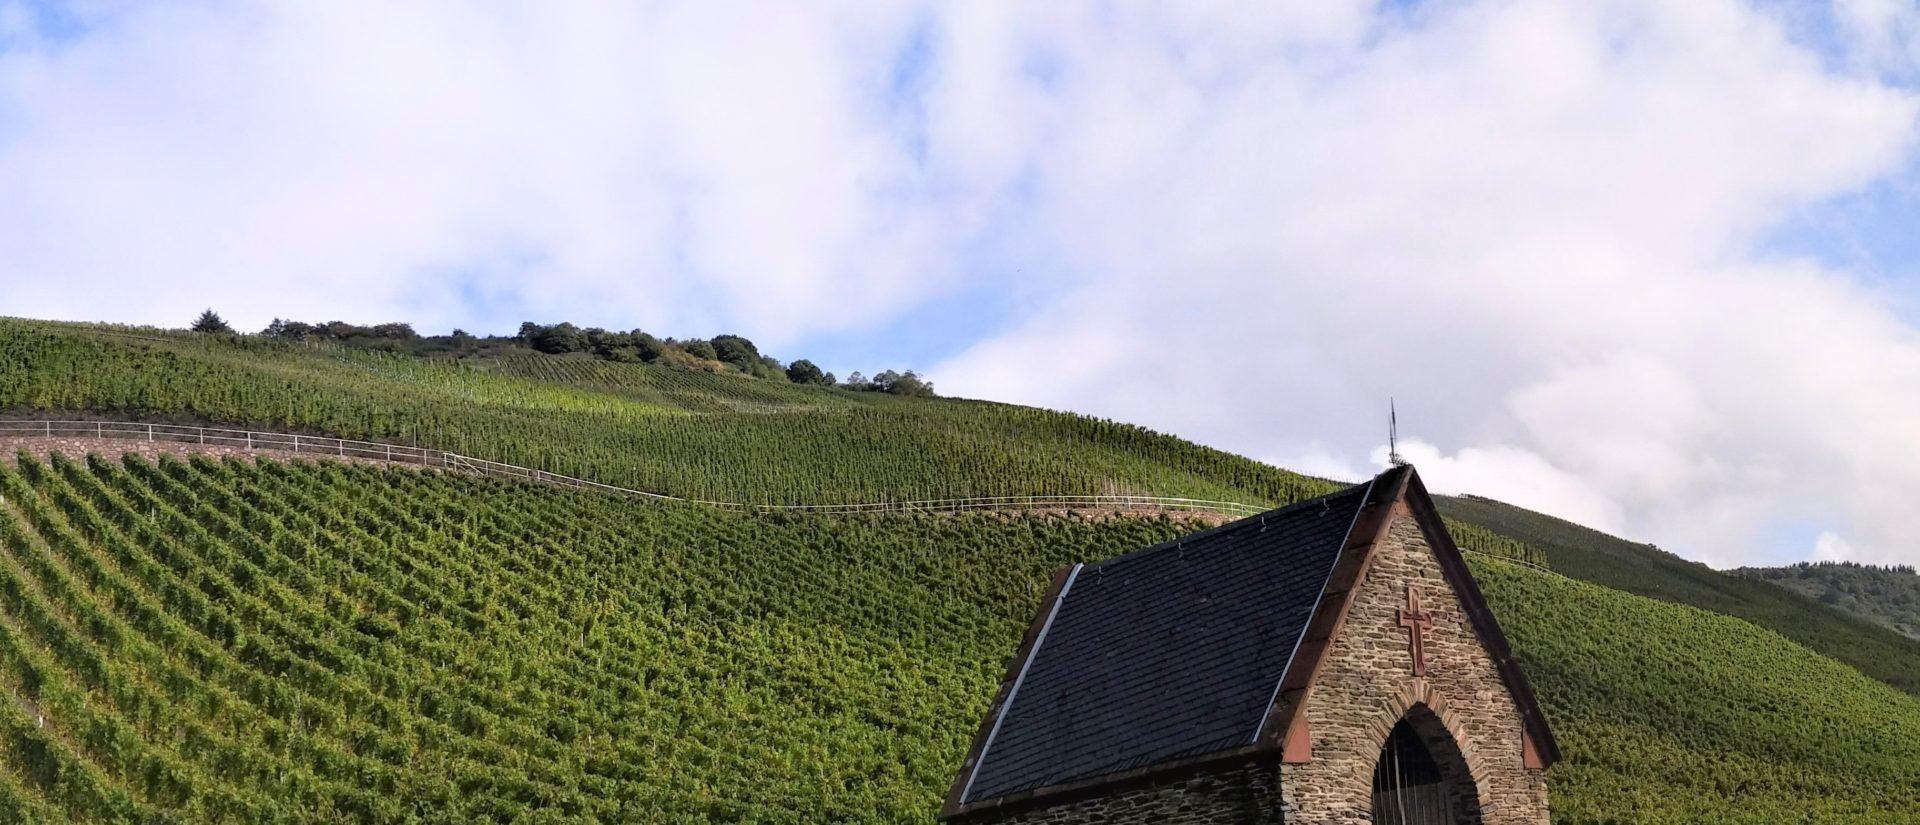 Vine Farmer